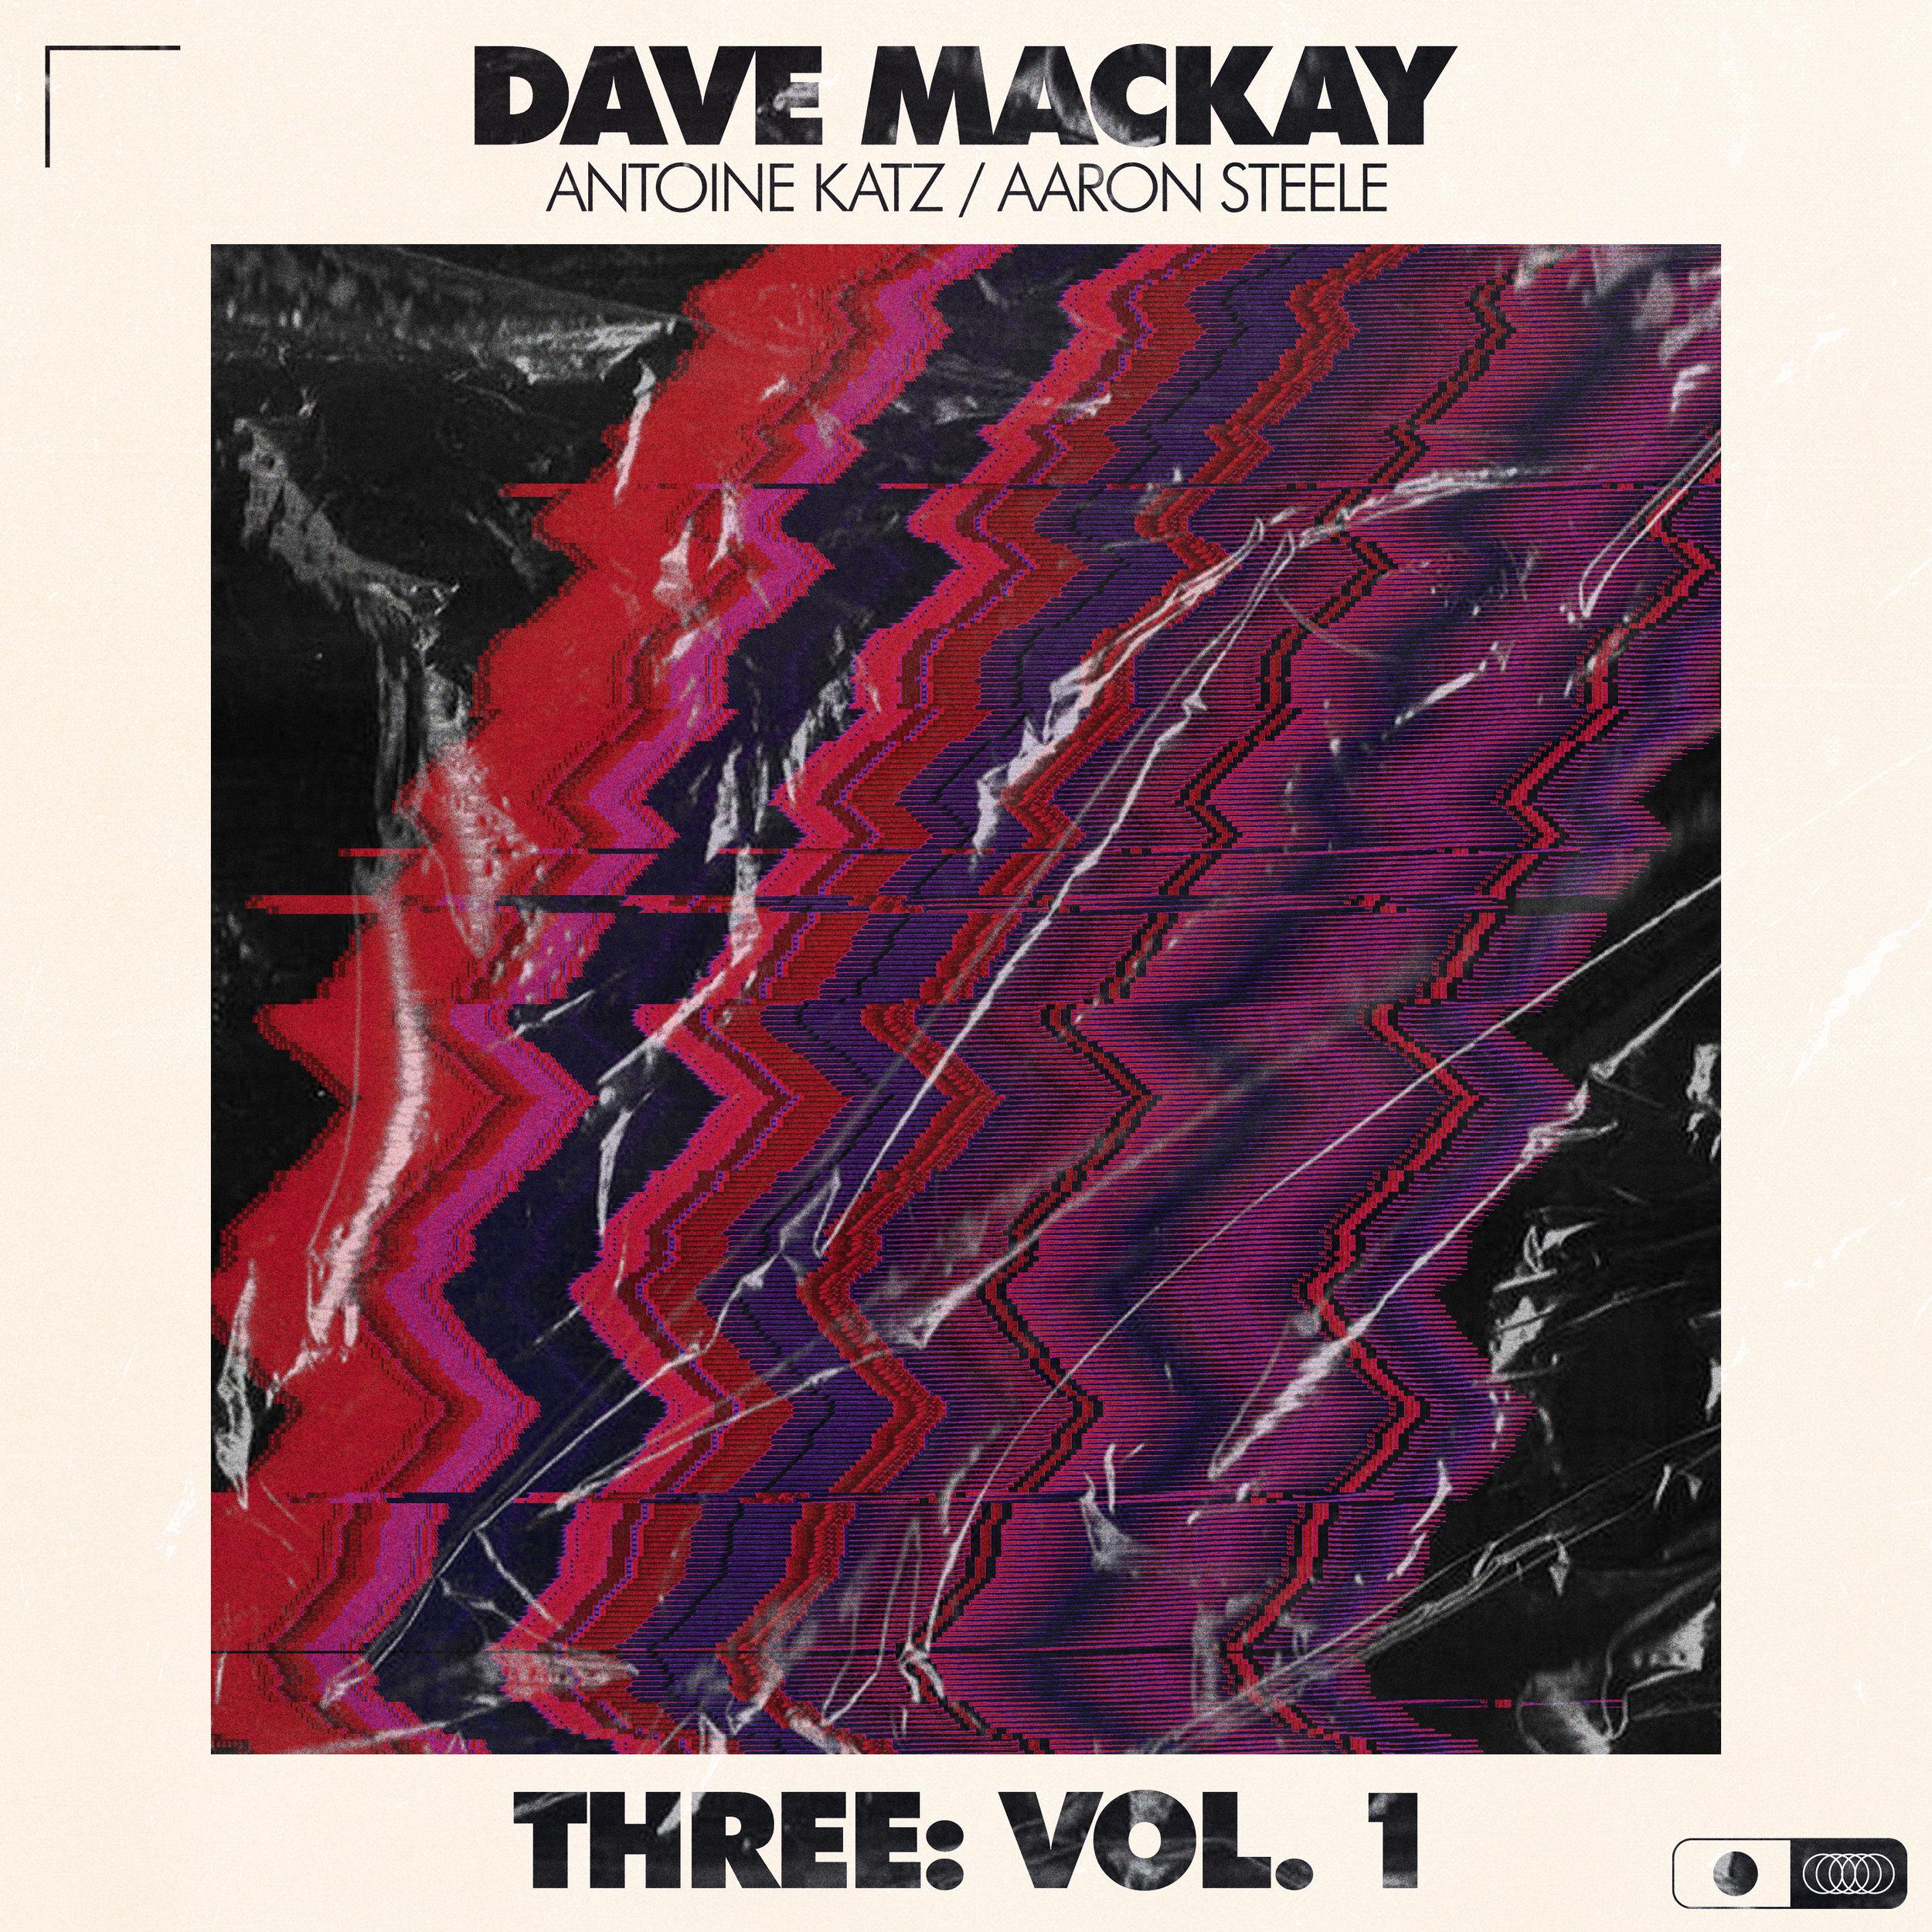 Dave Mackay - THREE VOL 1 Artwork.jpg